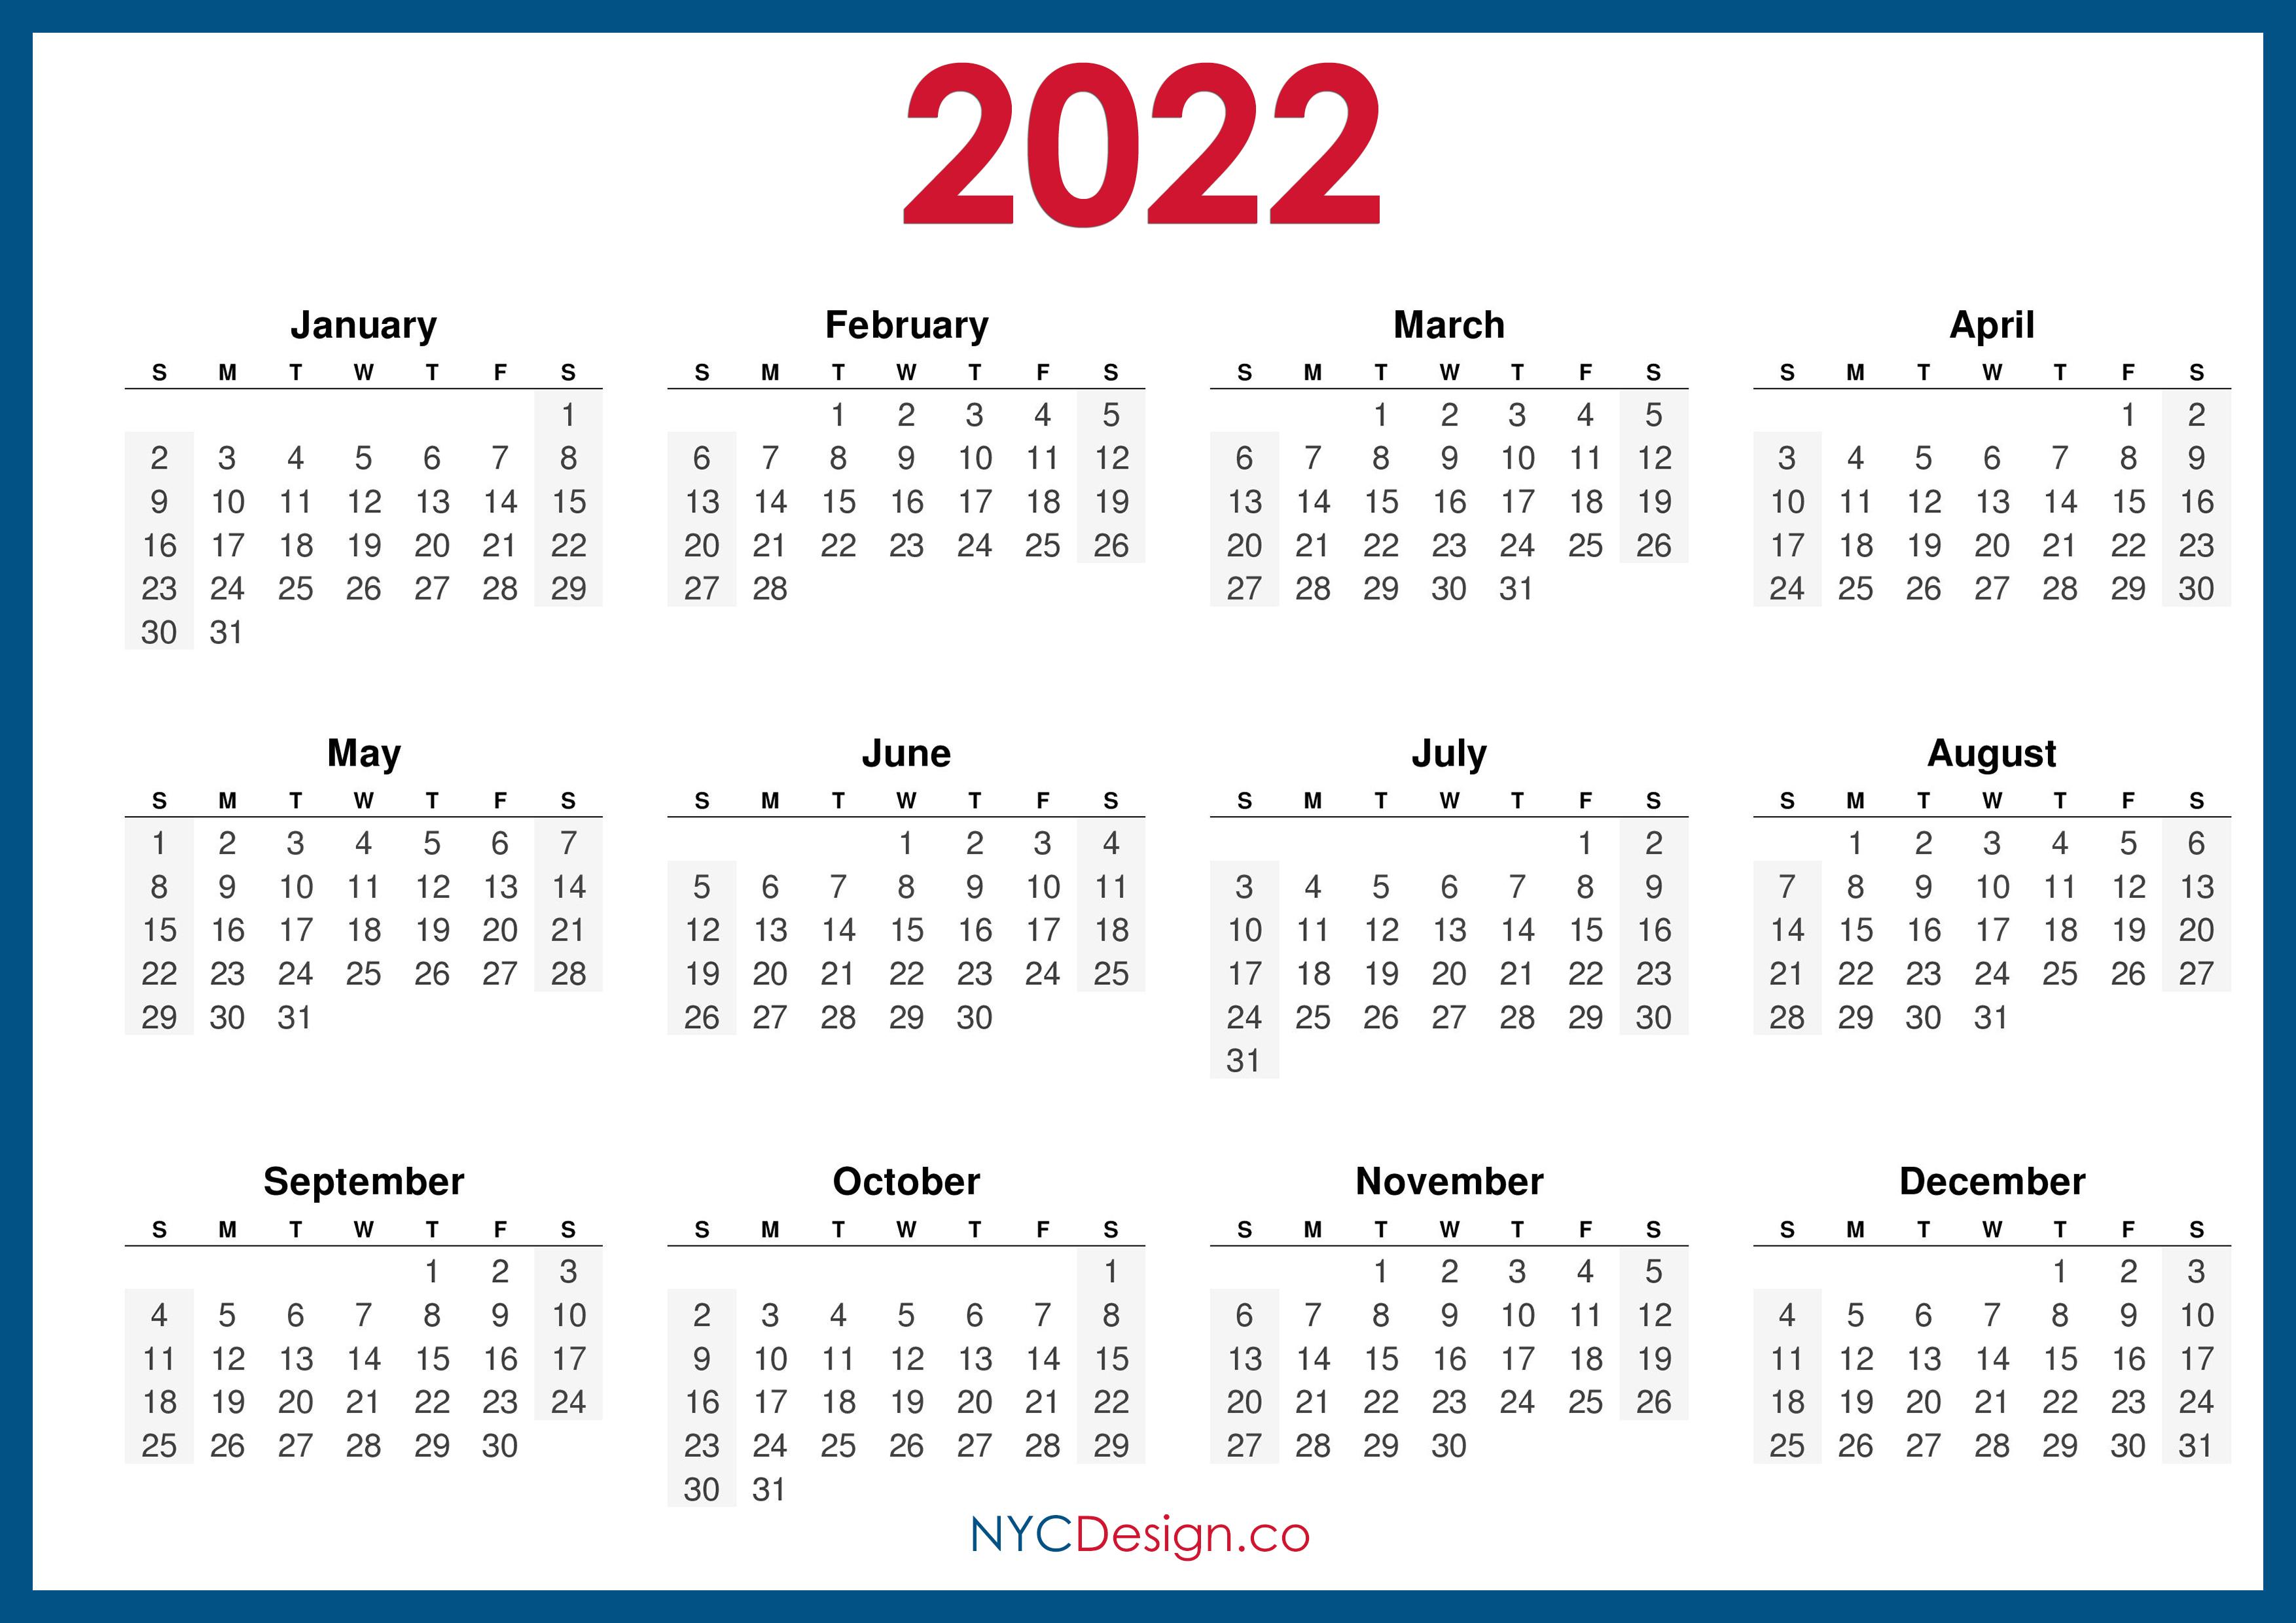 Full 2022 Calendar.2022 Calendar Printable Free Horizontal Blue Hd Sunday Start Nycdesign Co Calendars Printable Free